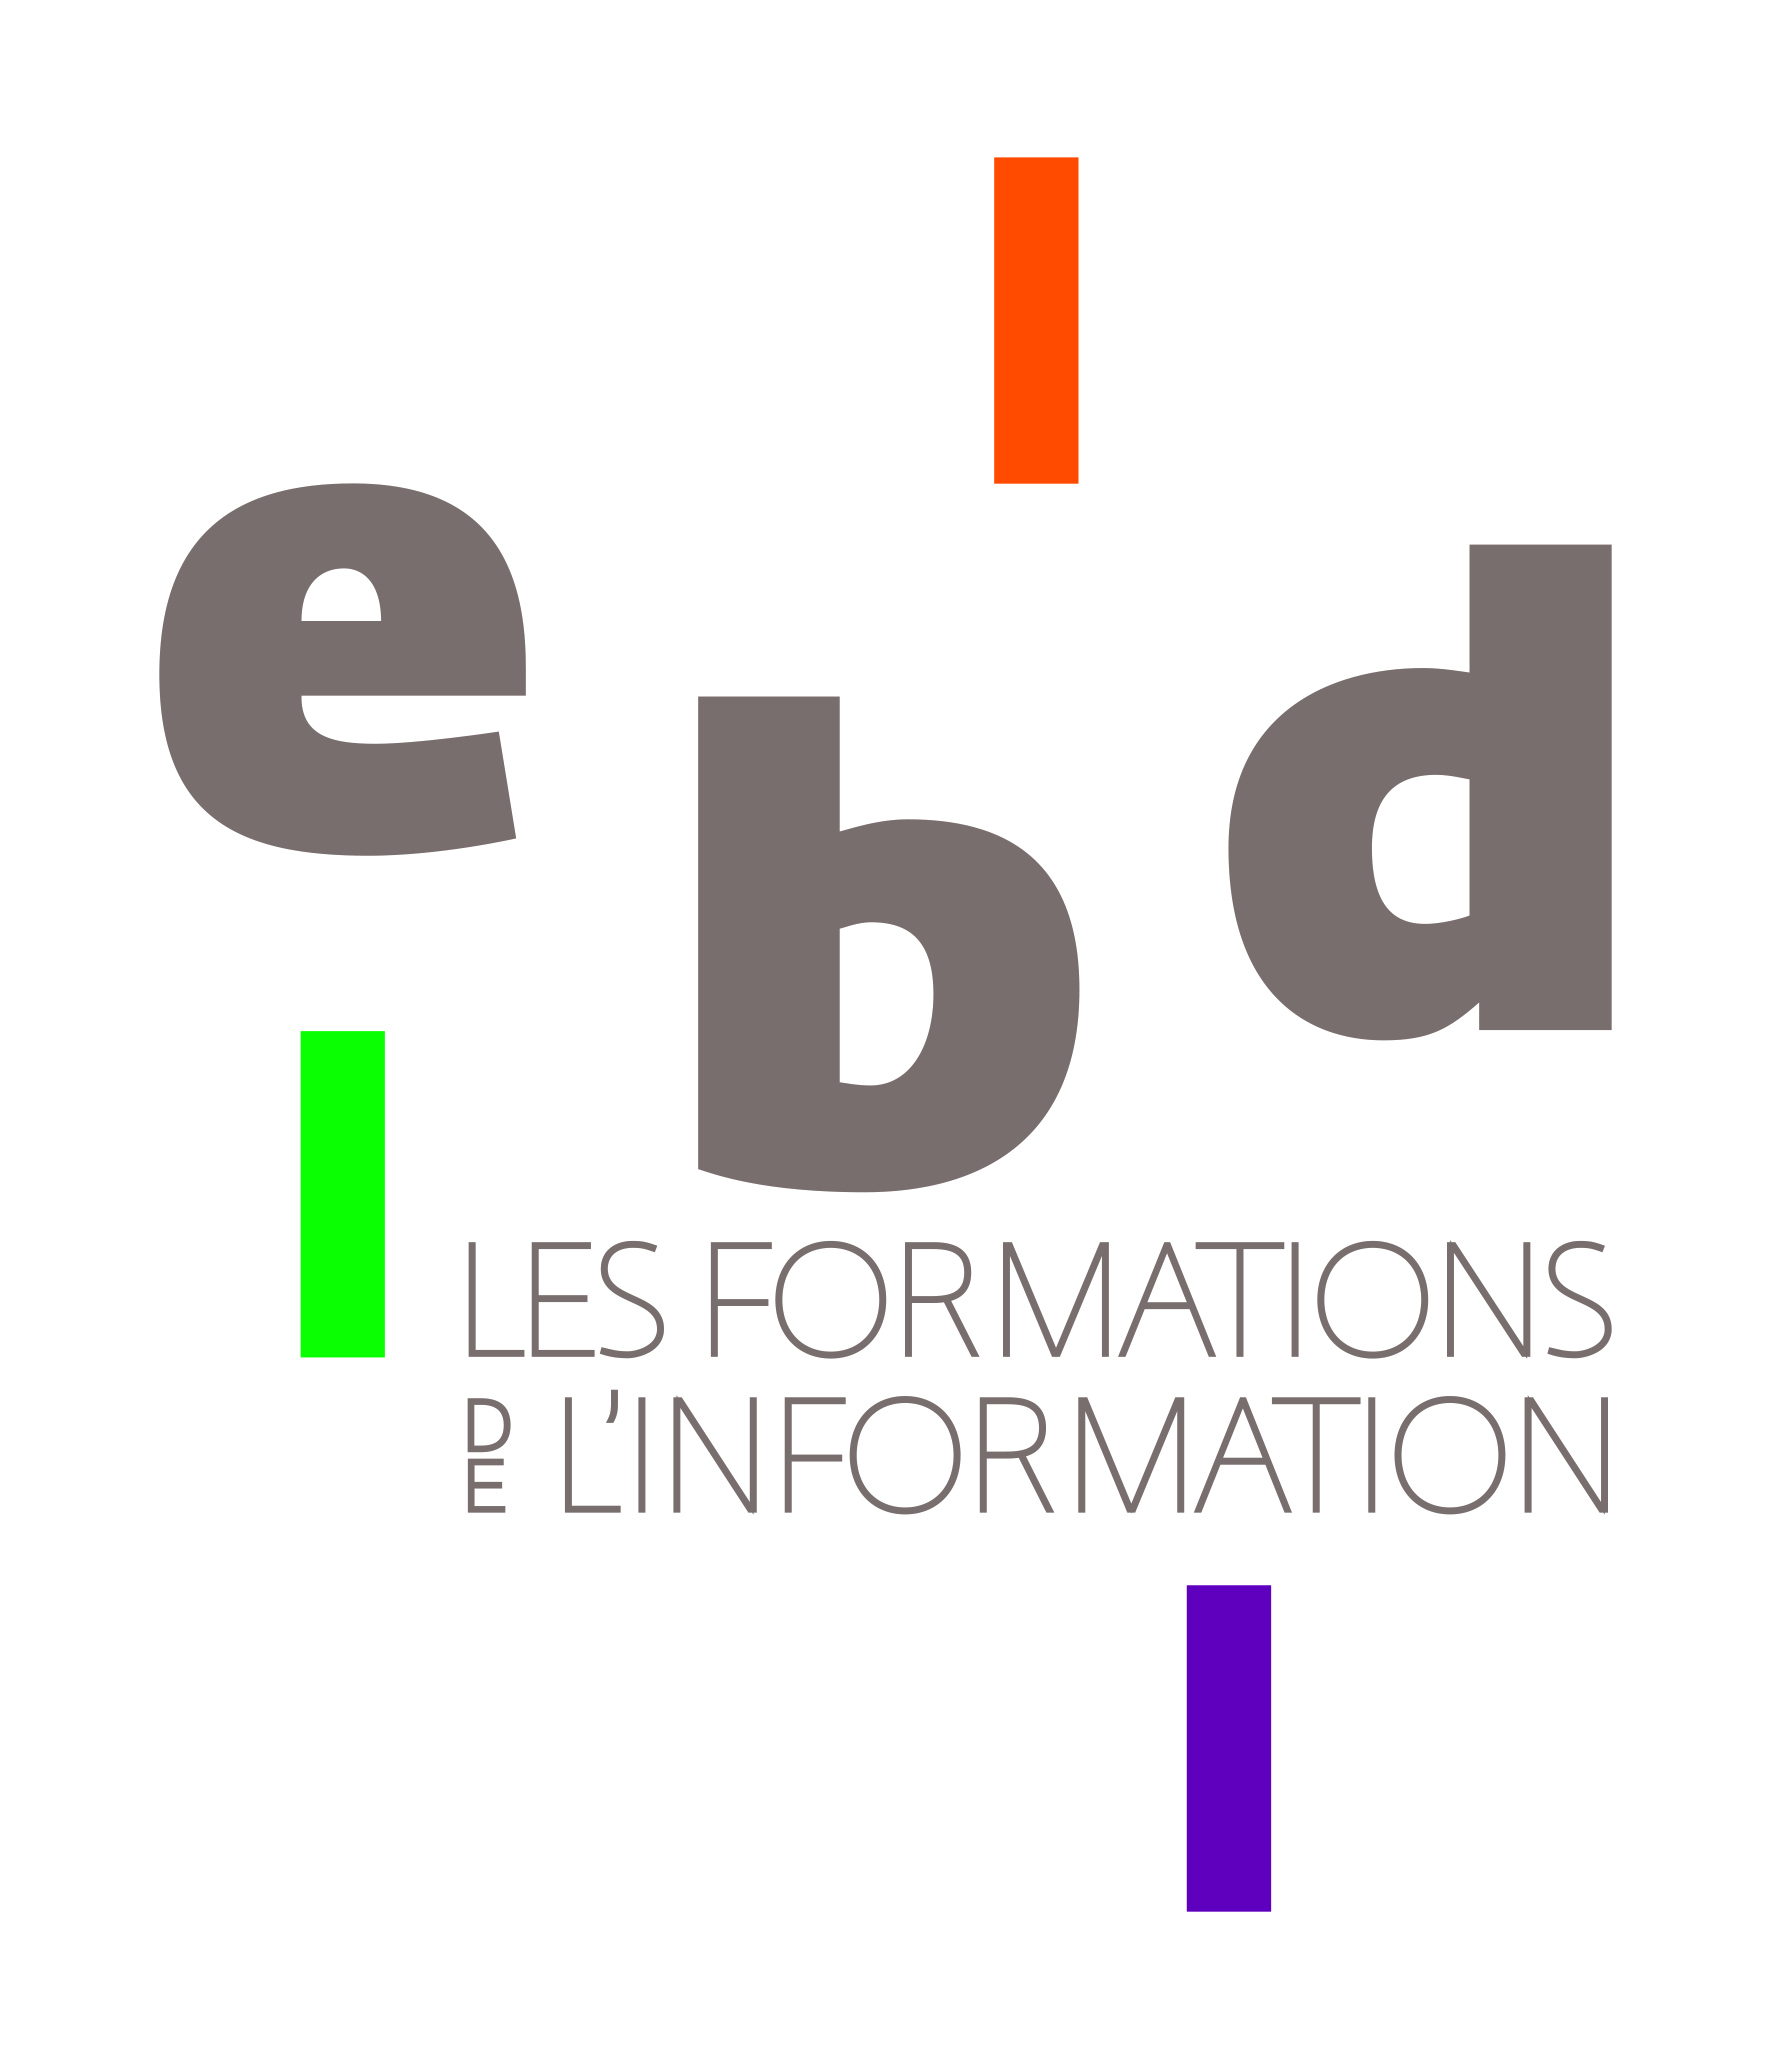 EBD- Les formations de l'information